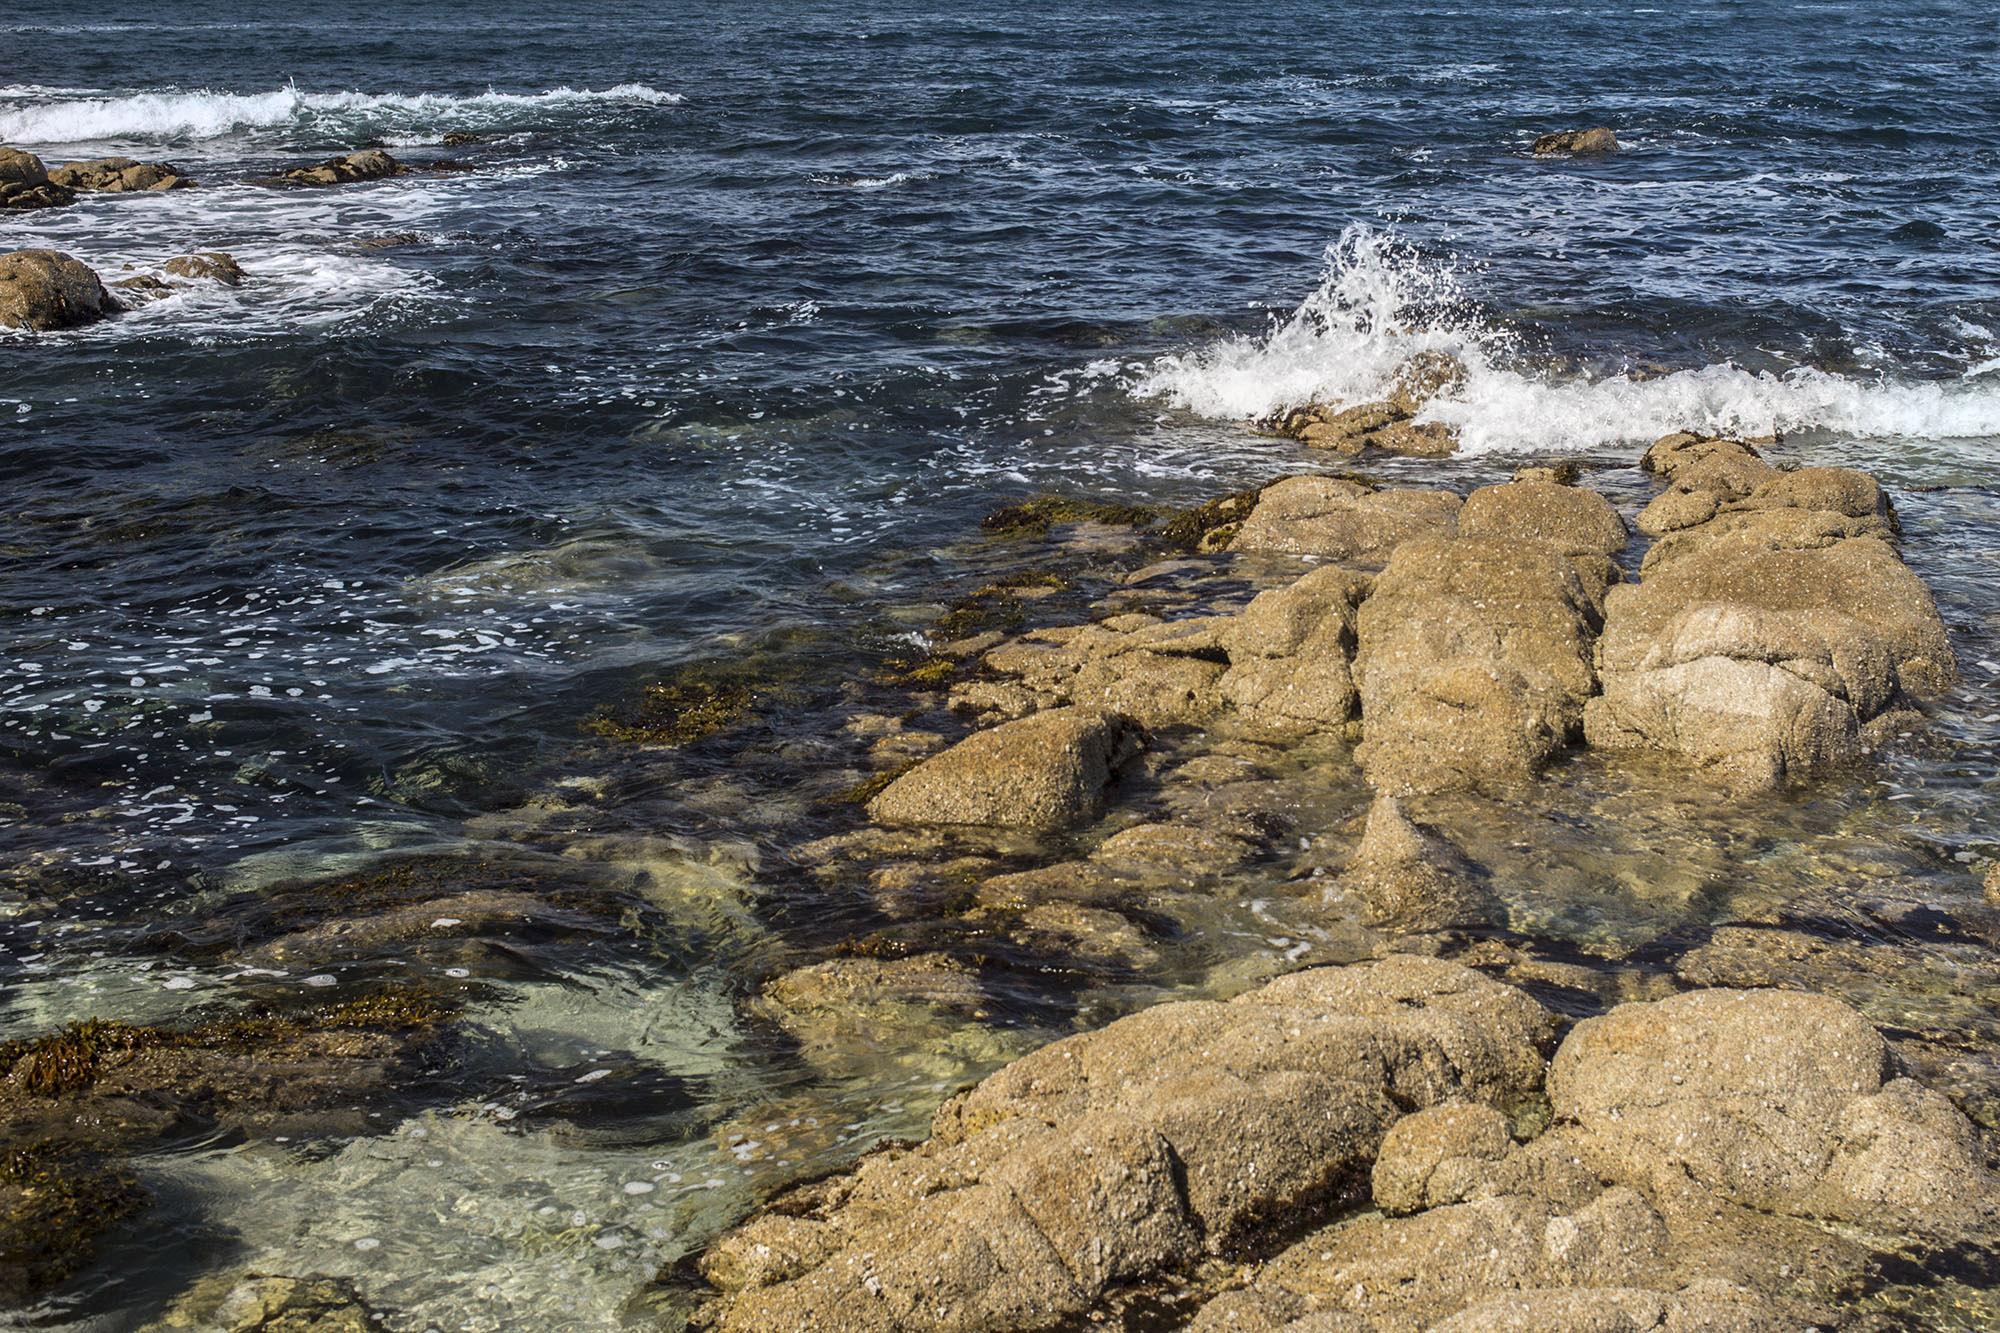 Rocky Shores no2 by Rich J. Velasco